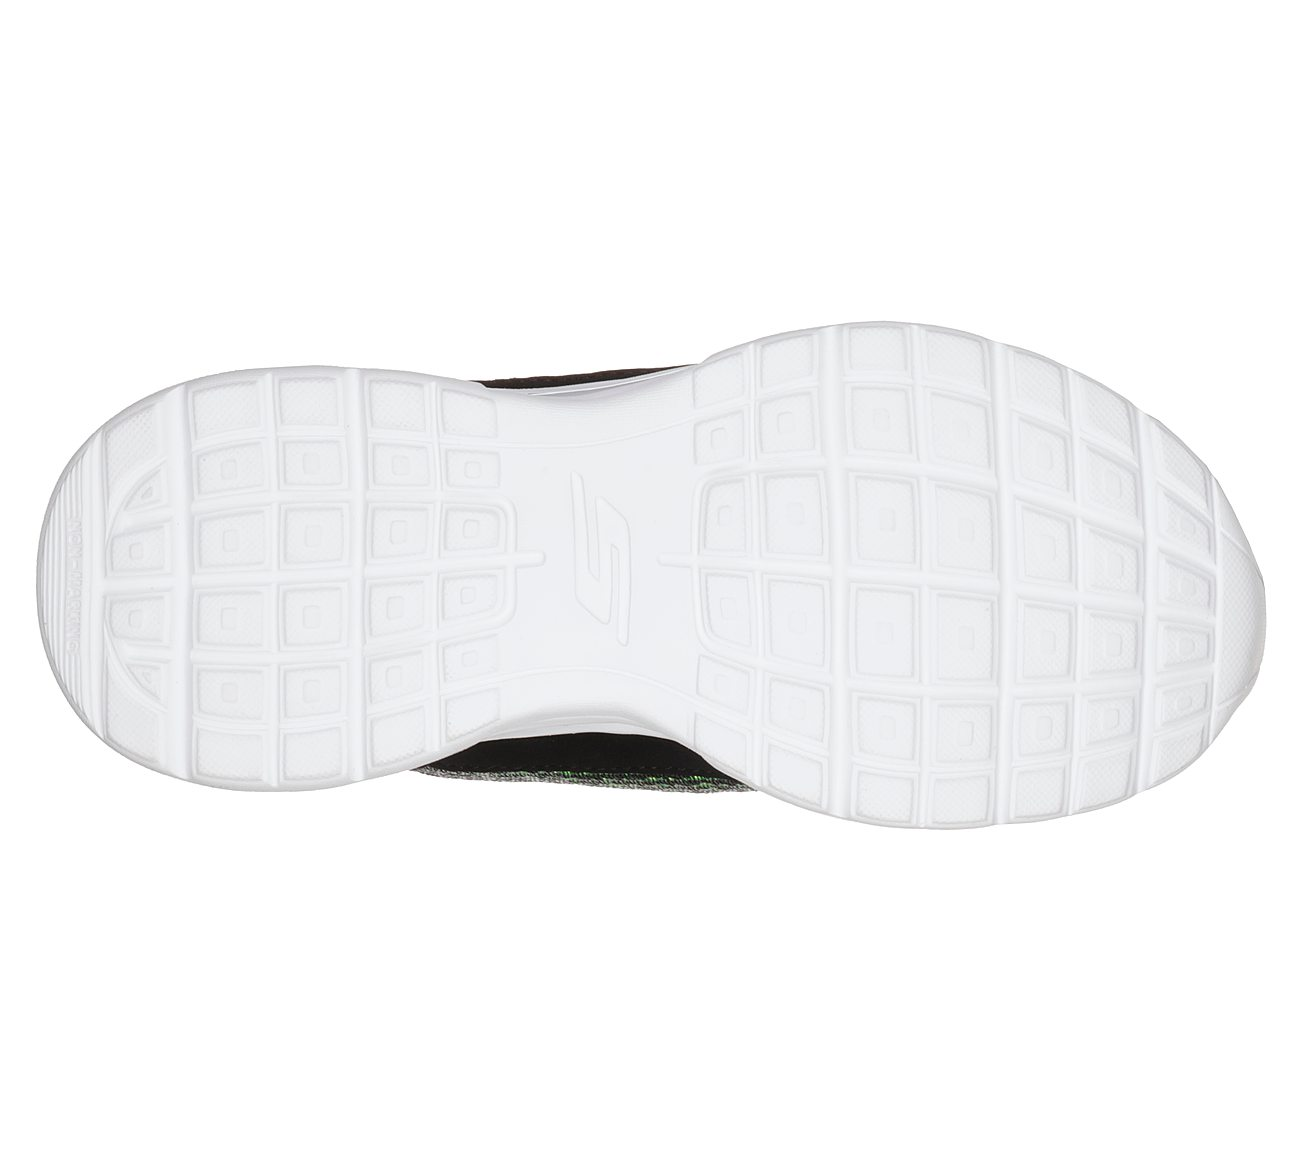 83c9621ebc8b Buy SKECHERS S Lights  Luminators S-Lights Shoes only  77.00